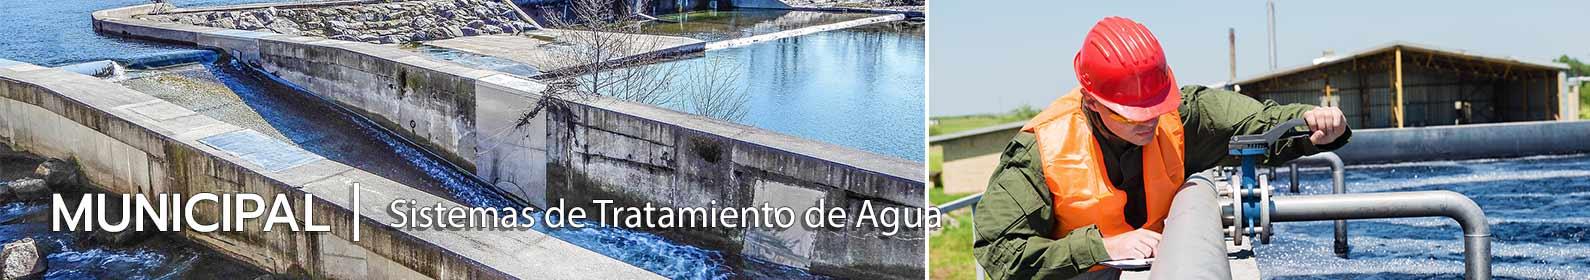 sistemas-de-tratamiento-de-agua-municipal.jpg